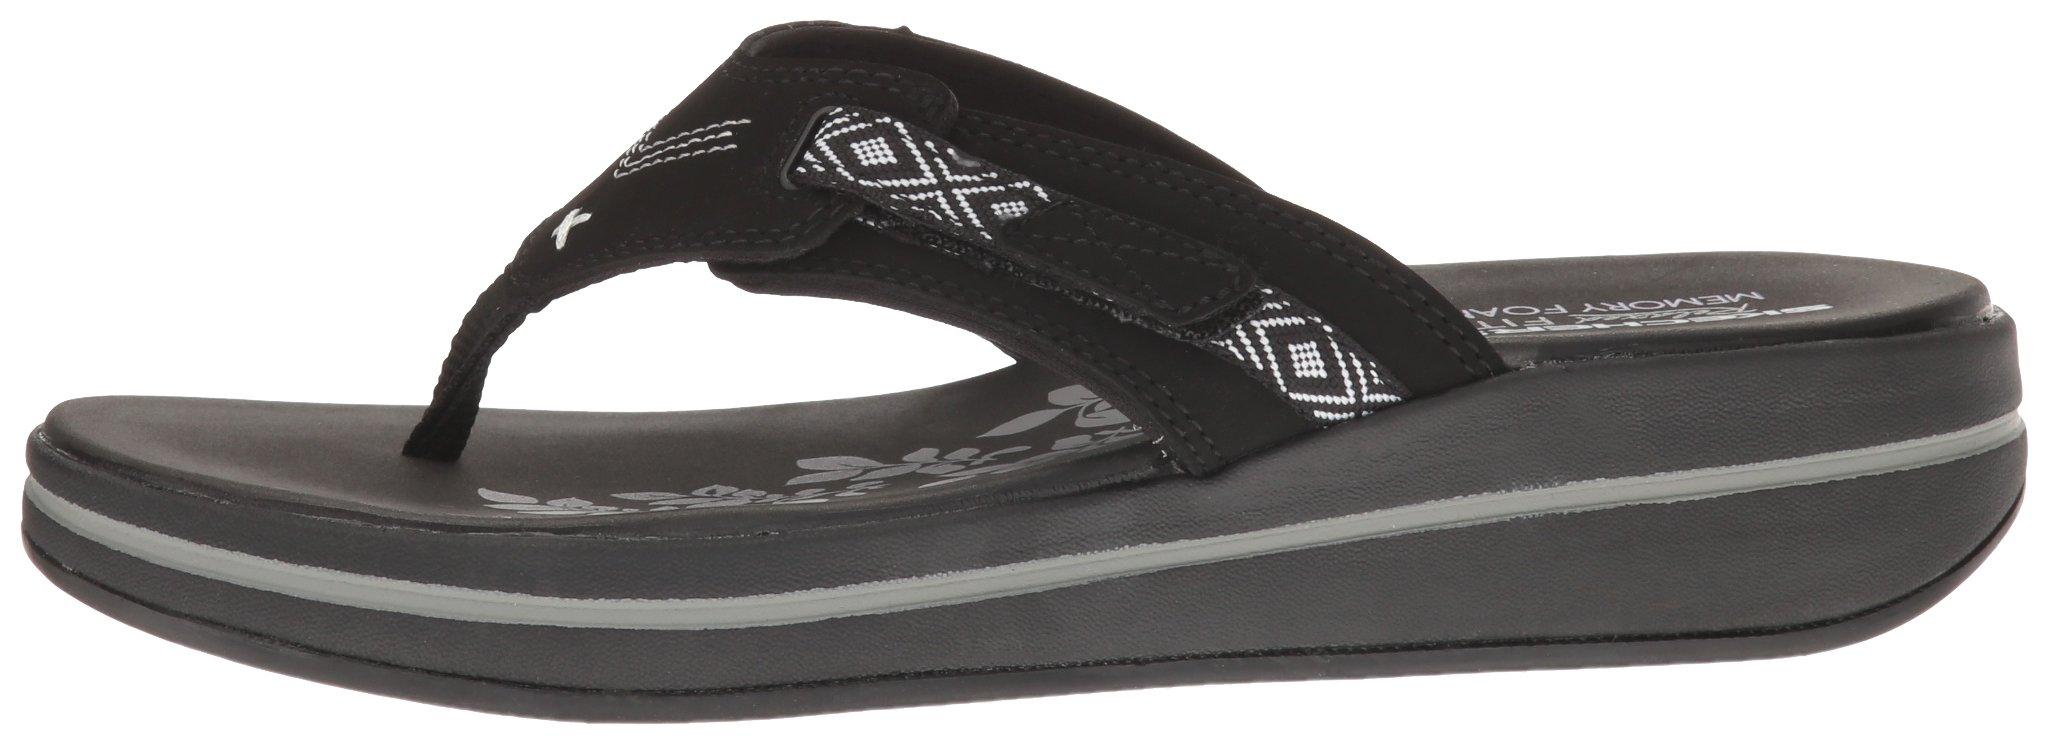 Skechers Modern Comfort Sandals Women's Upgrades Marina Bay Flip Flop Black/White, 8 M US by Skechers (Image #5)